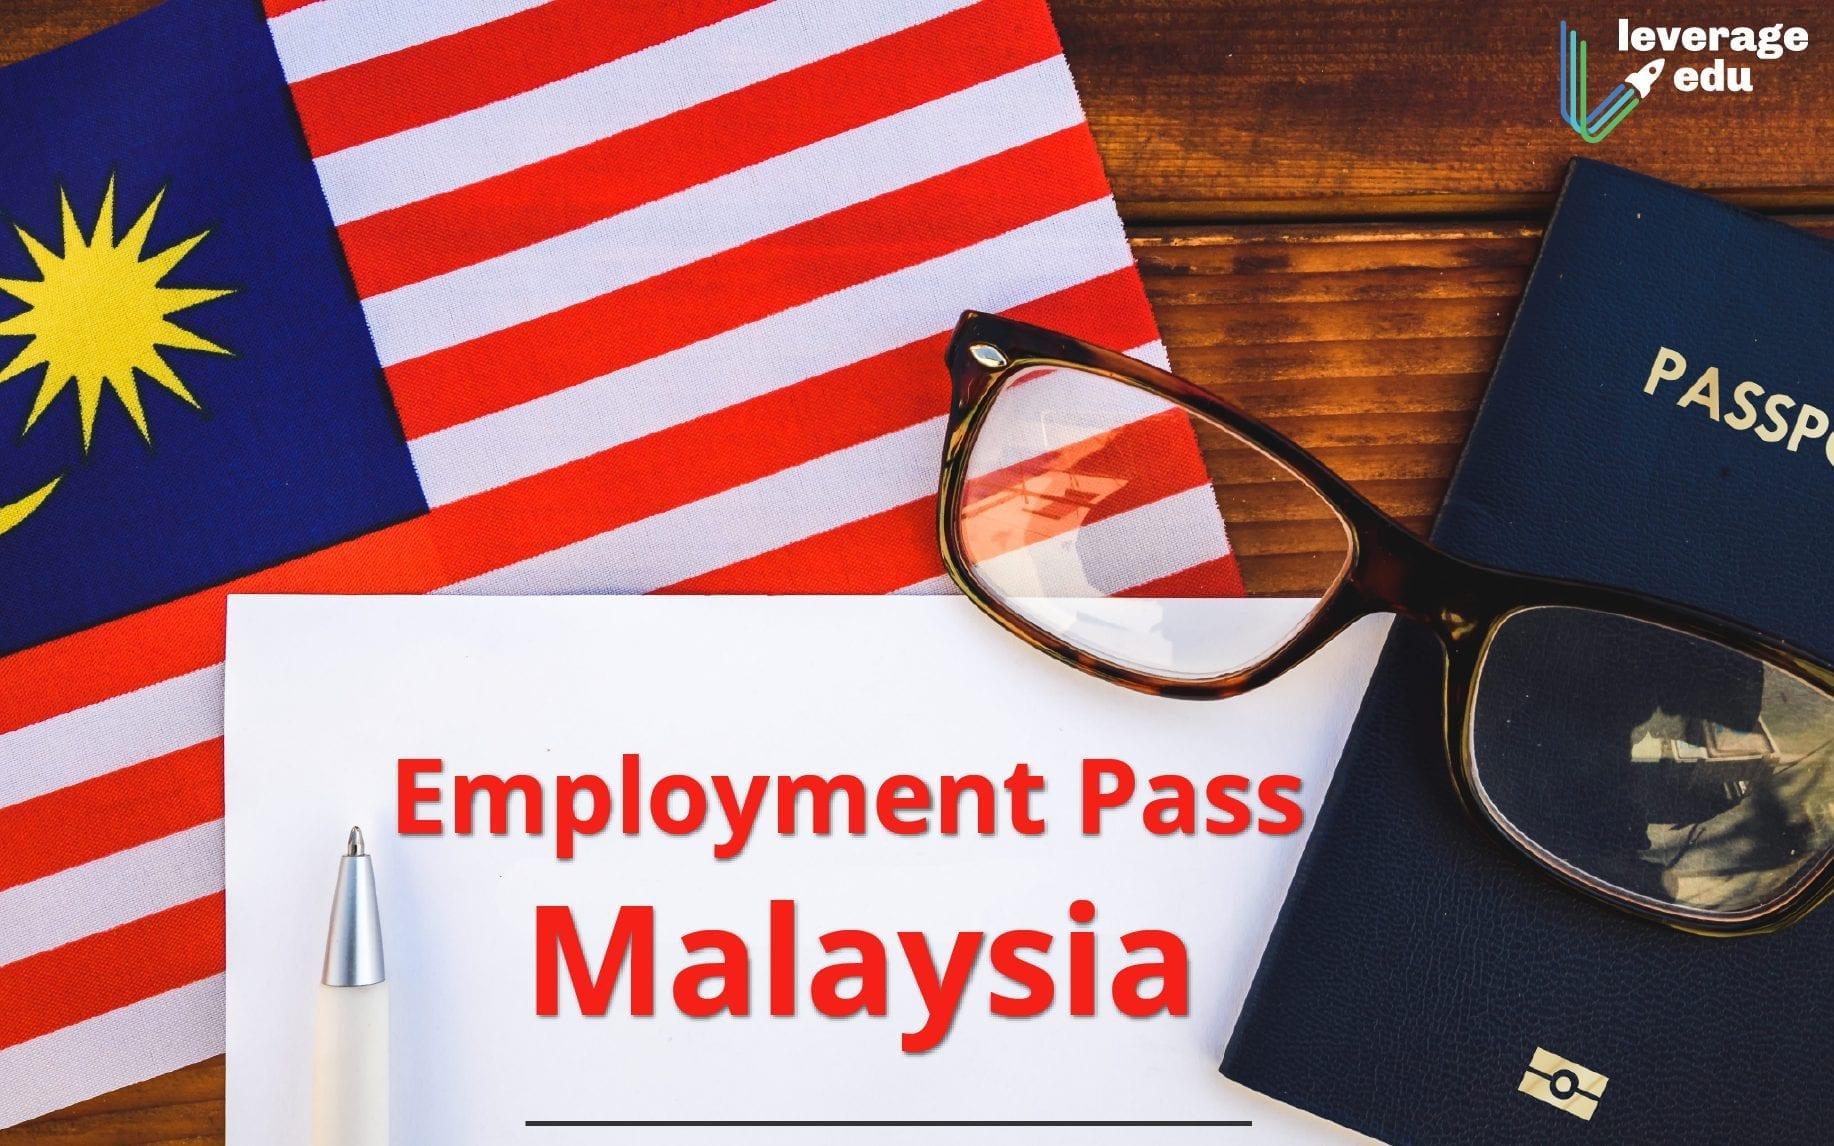 Employment Pass Malaysia